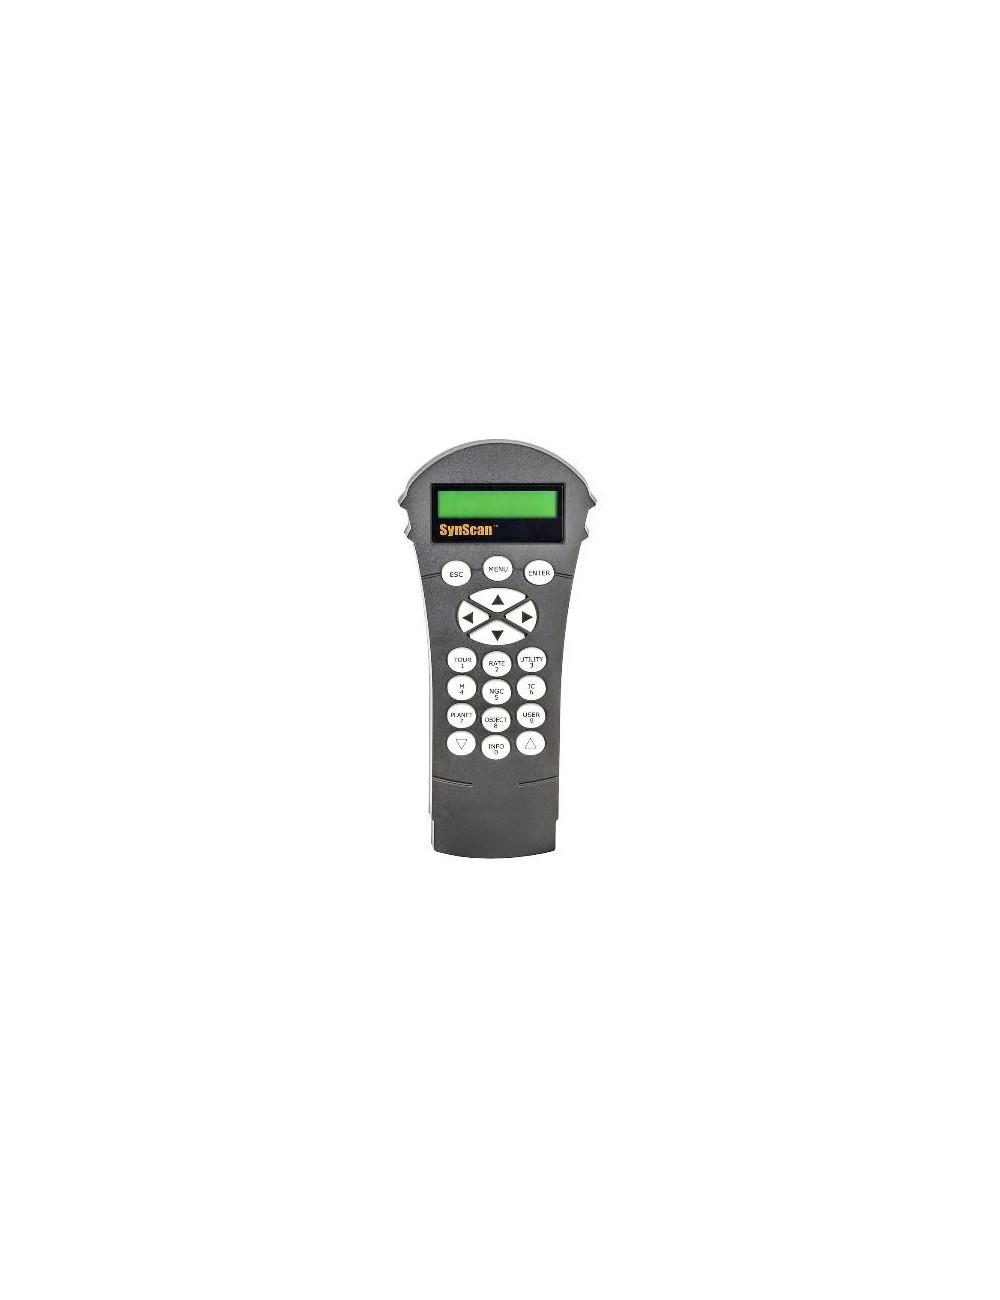 Raquette Go-To Sky-Watcher pour HEQ5 / EQ6-R / AZ-EQ6